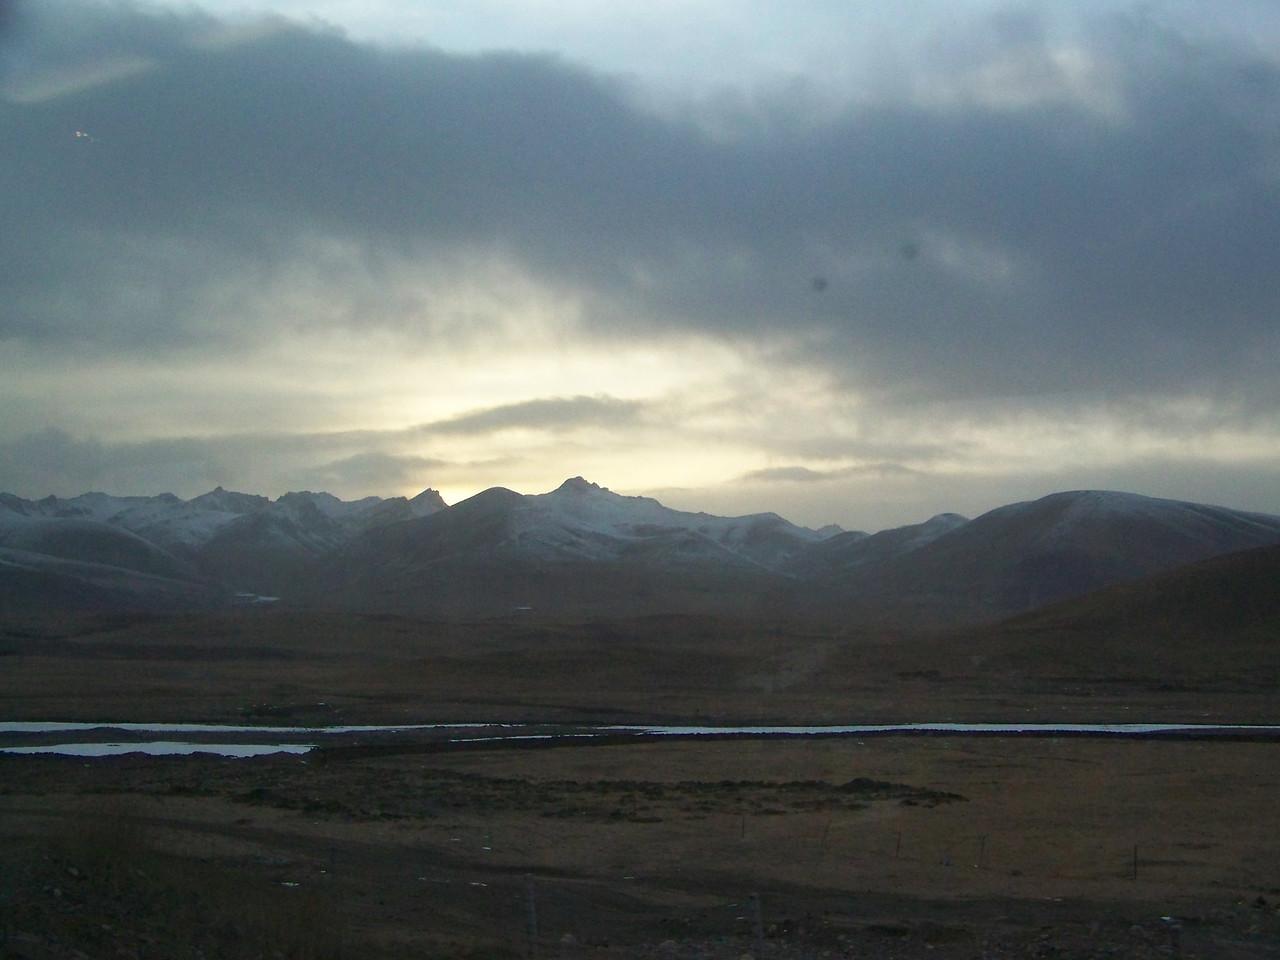 0096 - Scenery on Train Trip Between Beijing and Lhasa.JPG